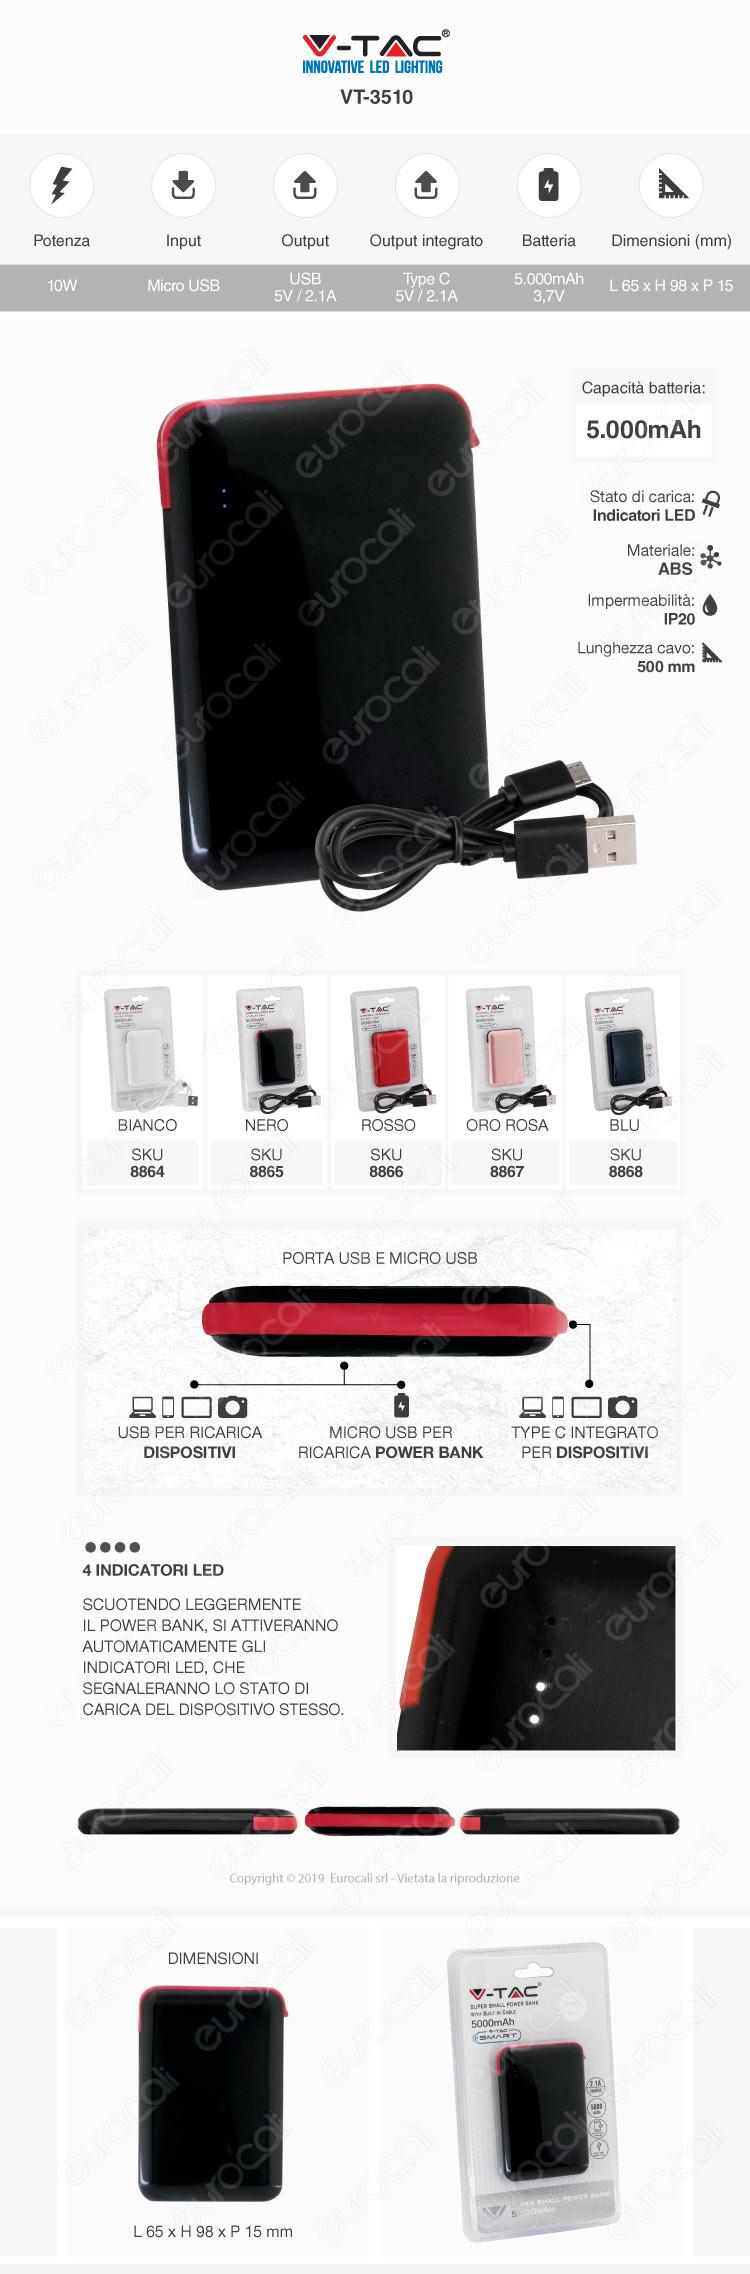 V-Tac VT-3504 Power Bank Portatile 10000 mAh 2 Uscite USB 2,1A